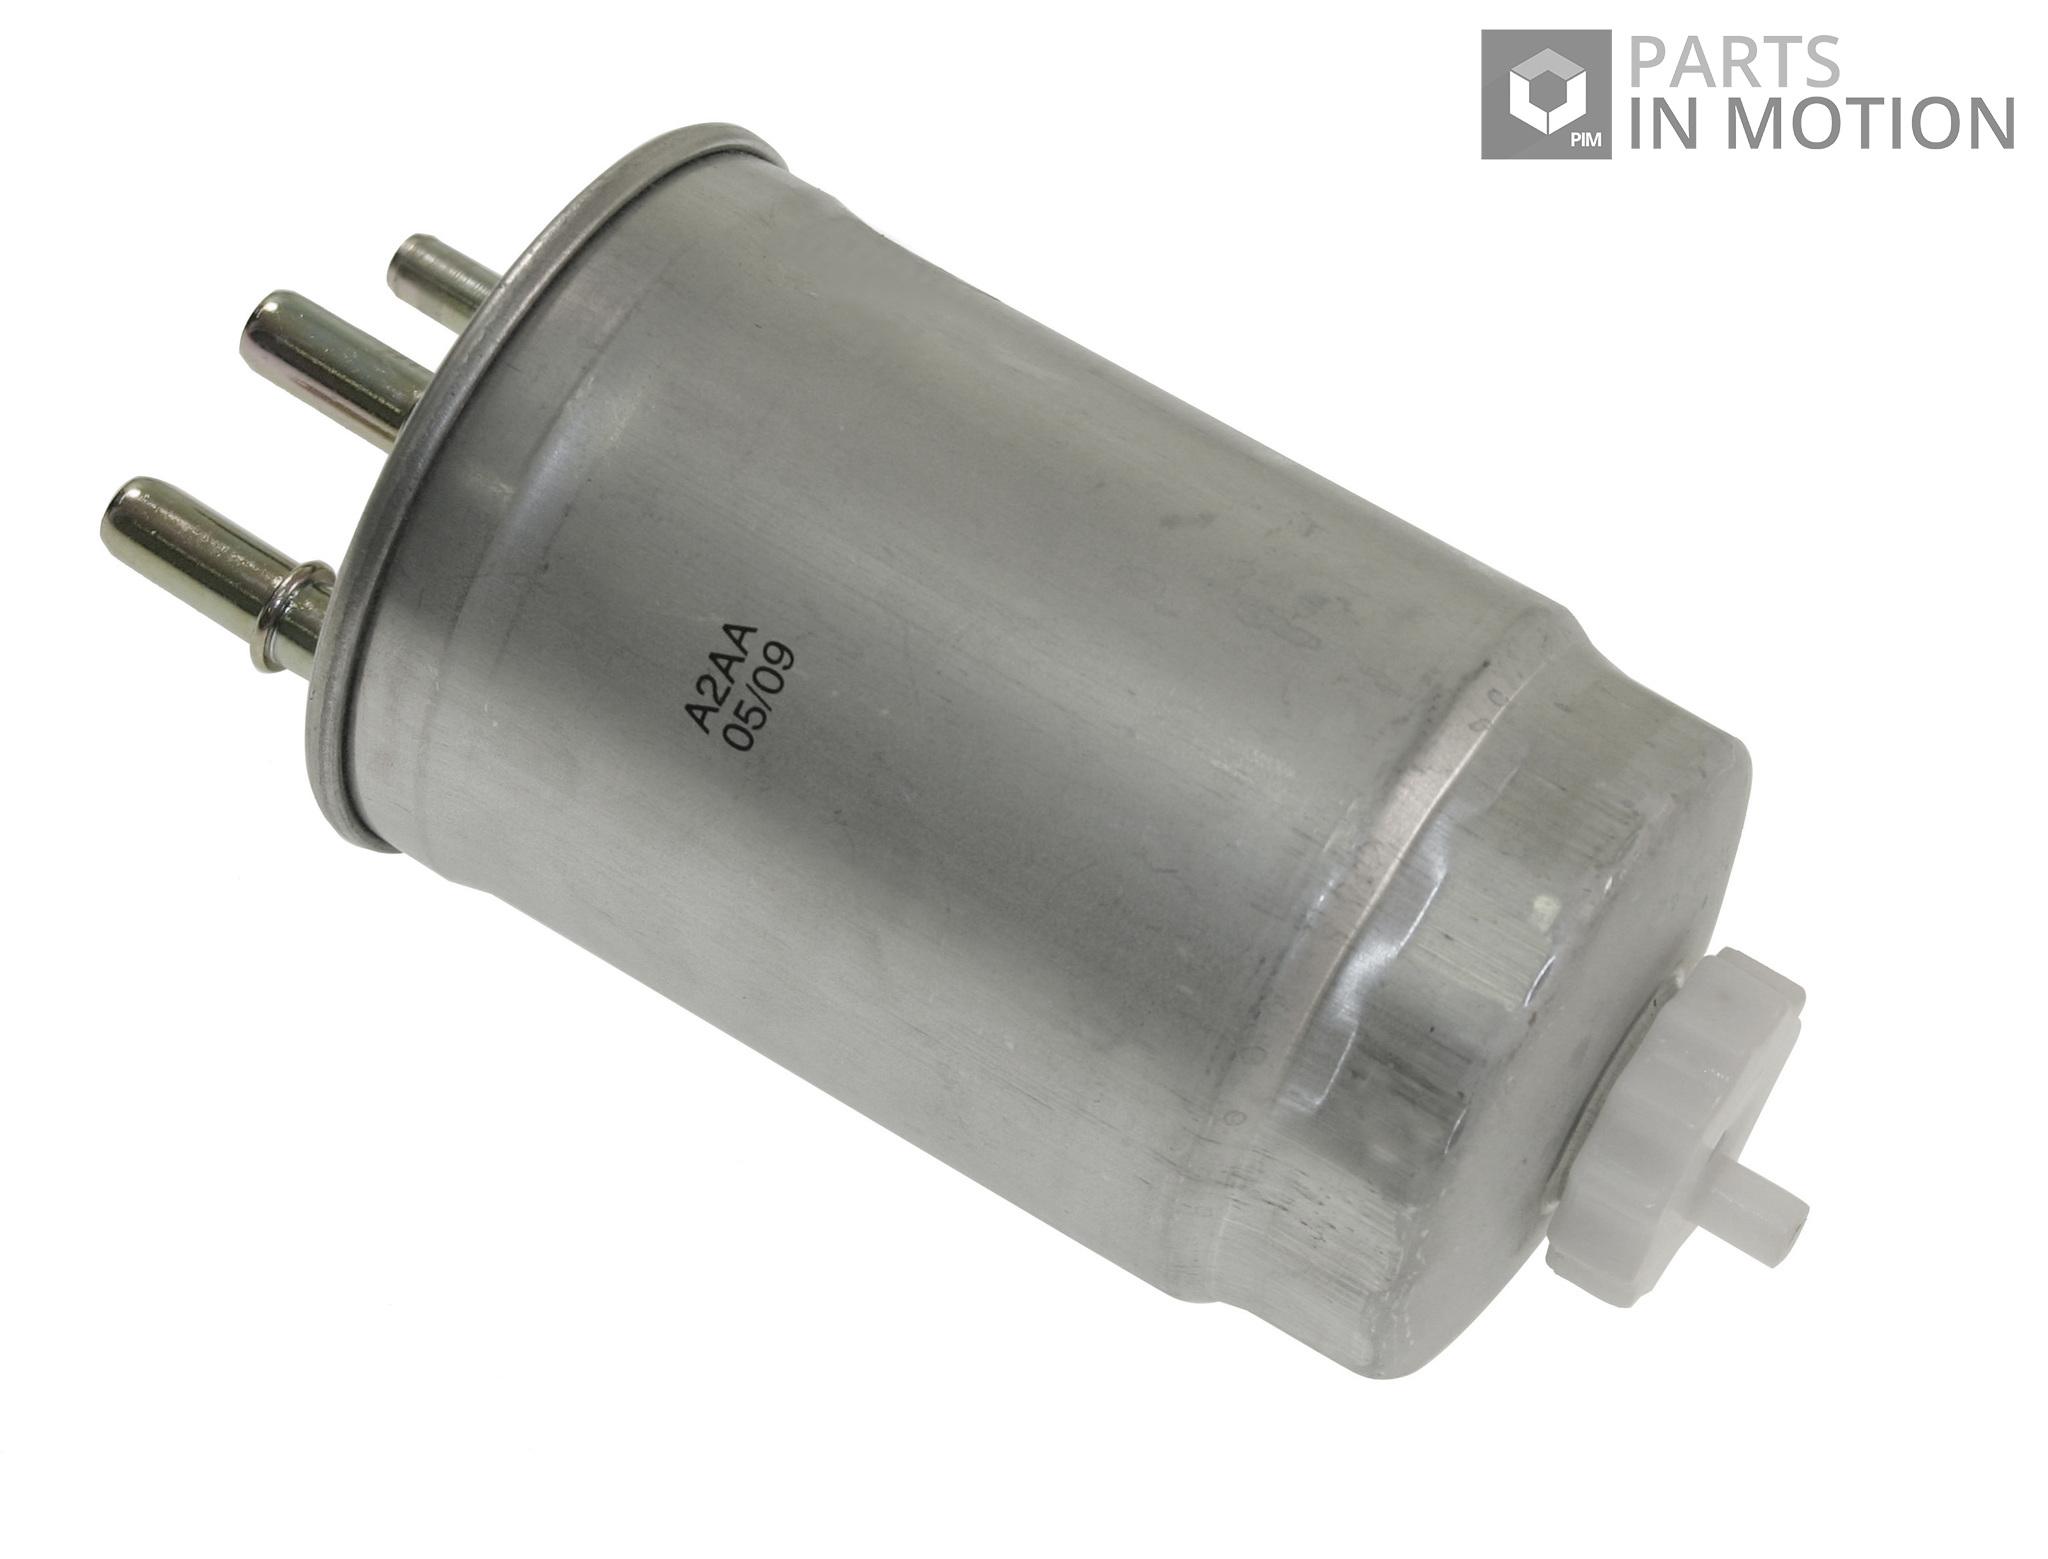 Fuel Filter fits KIA SEDONA 2 9D 2001 on ADG02342 Blue